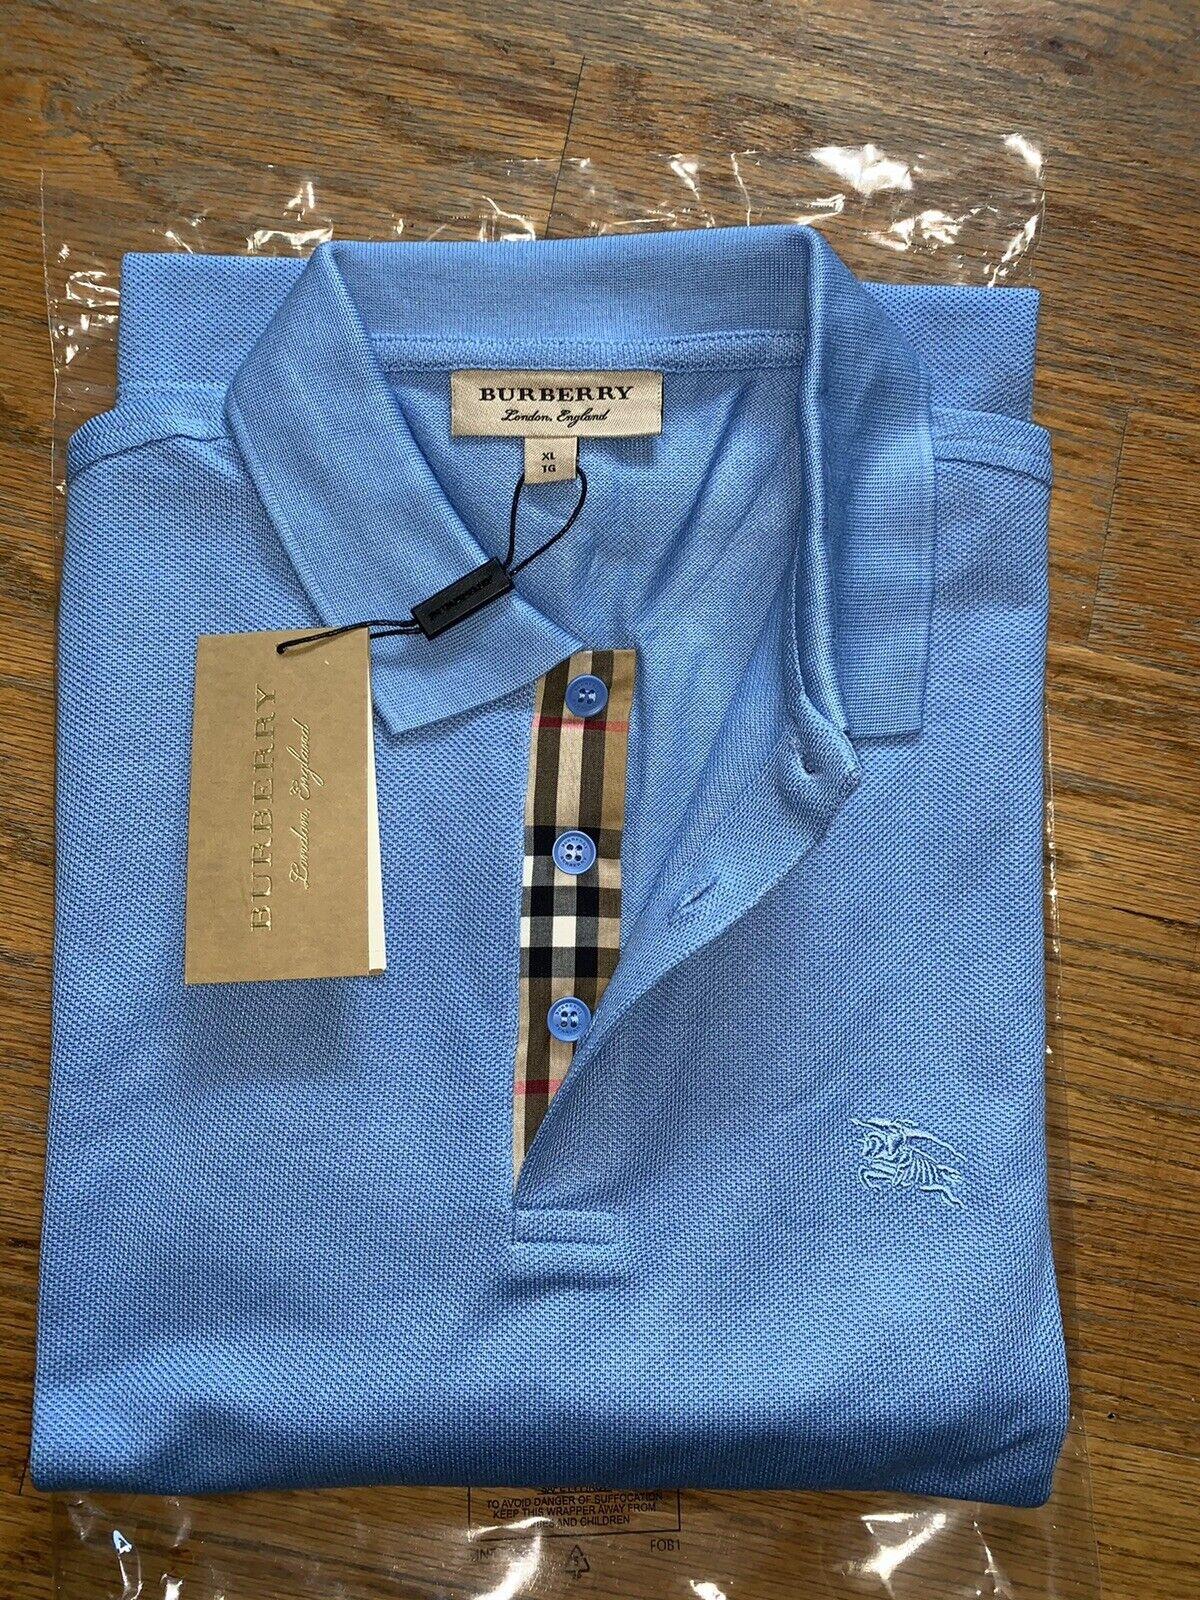 Burberry london men's nova check placket polo shirt s,m,l,xl,2xl,3xl